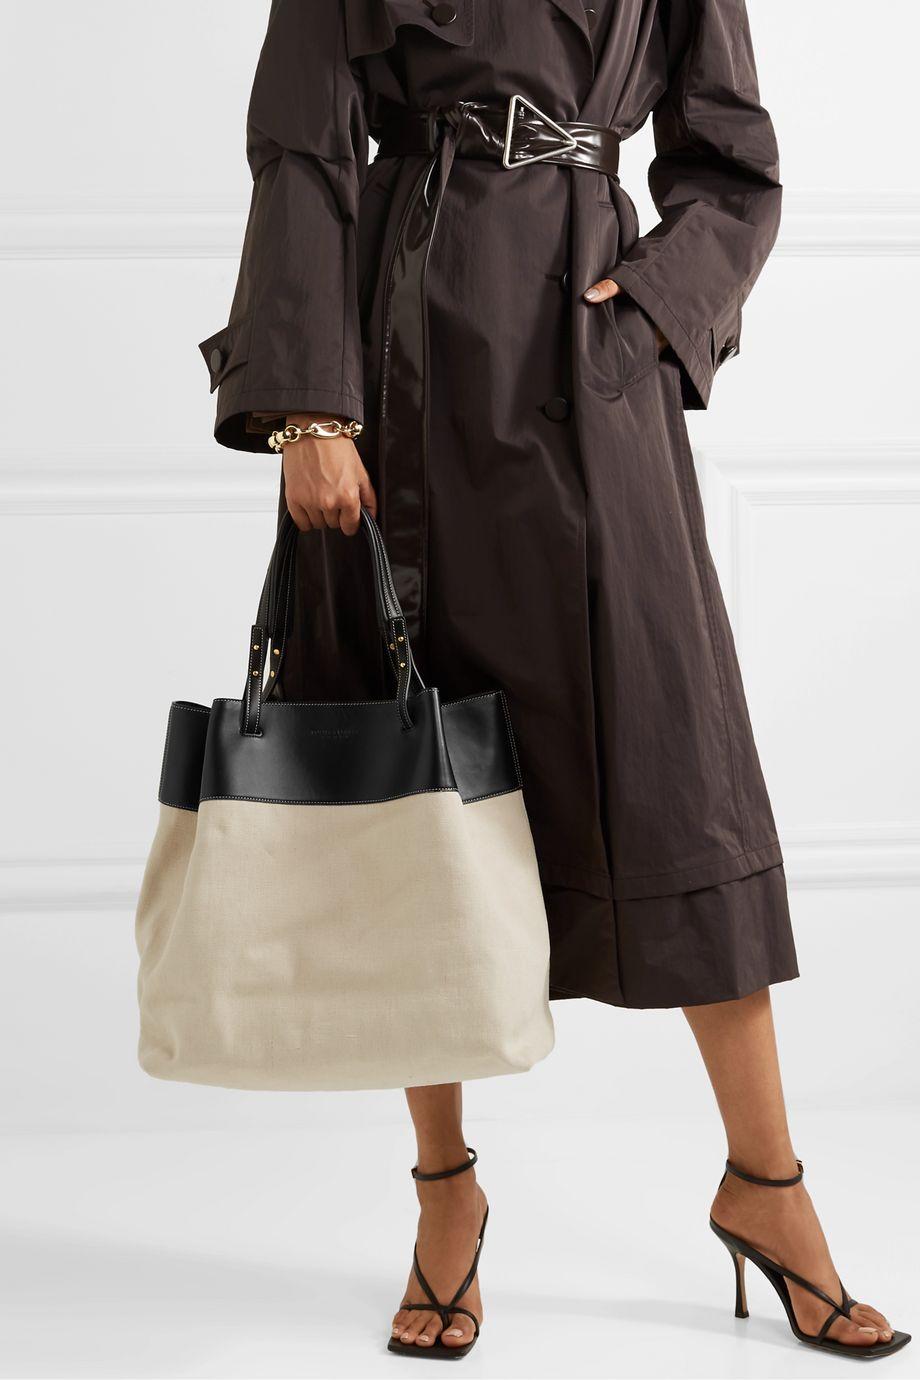 Bottega Veneta Large leather-trimmed linen tote